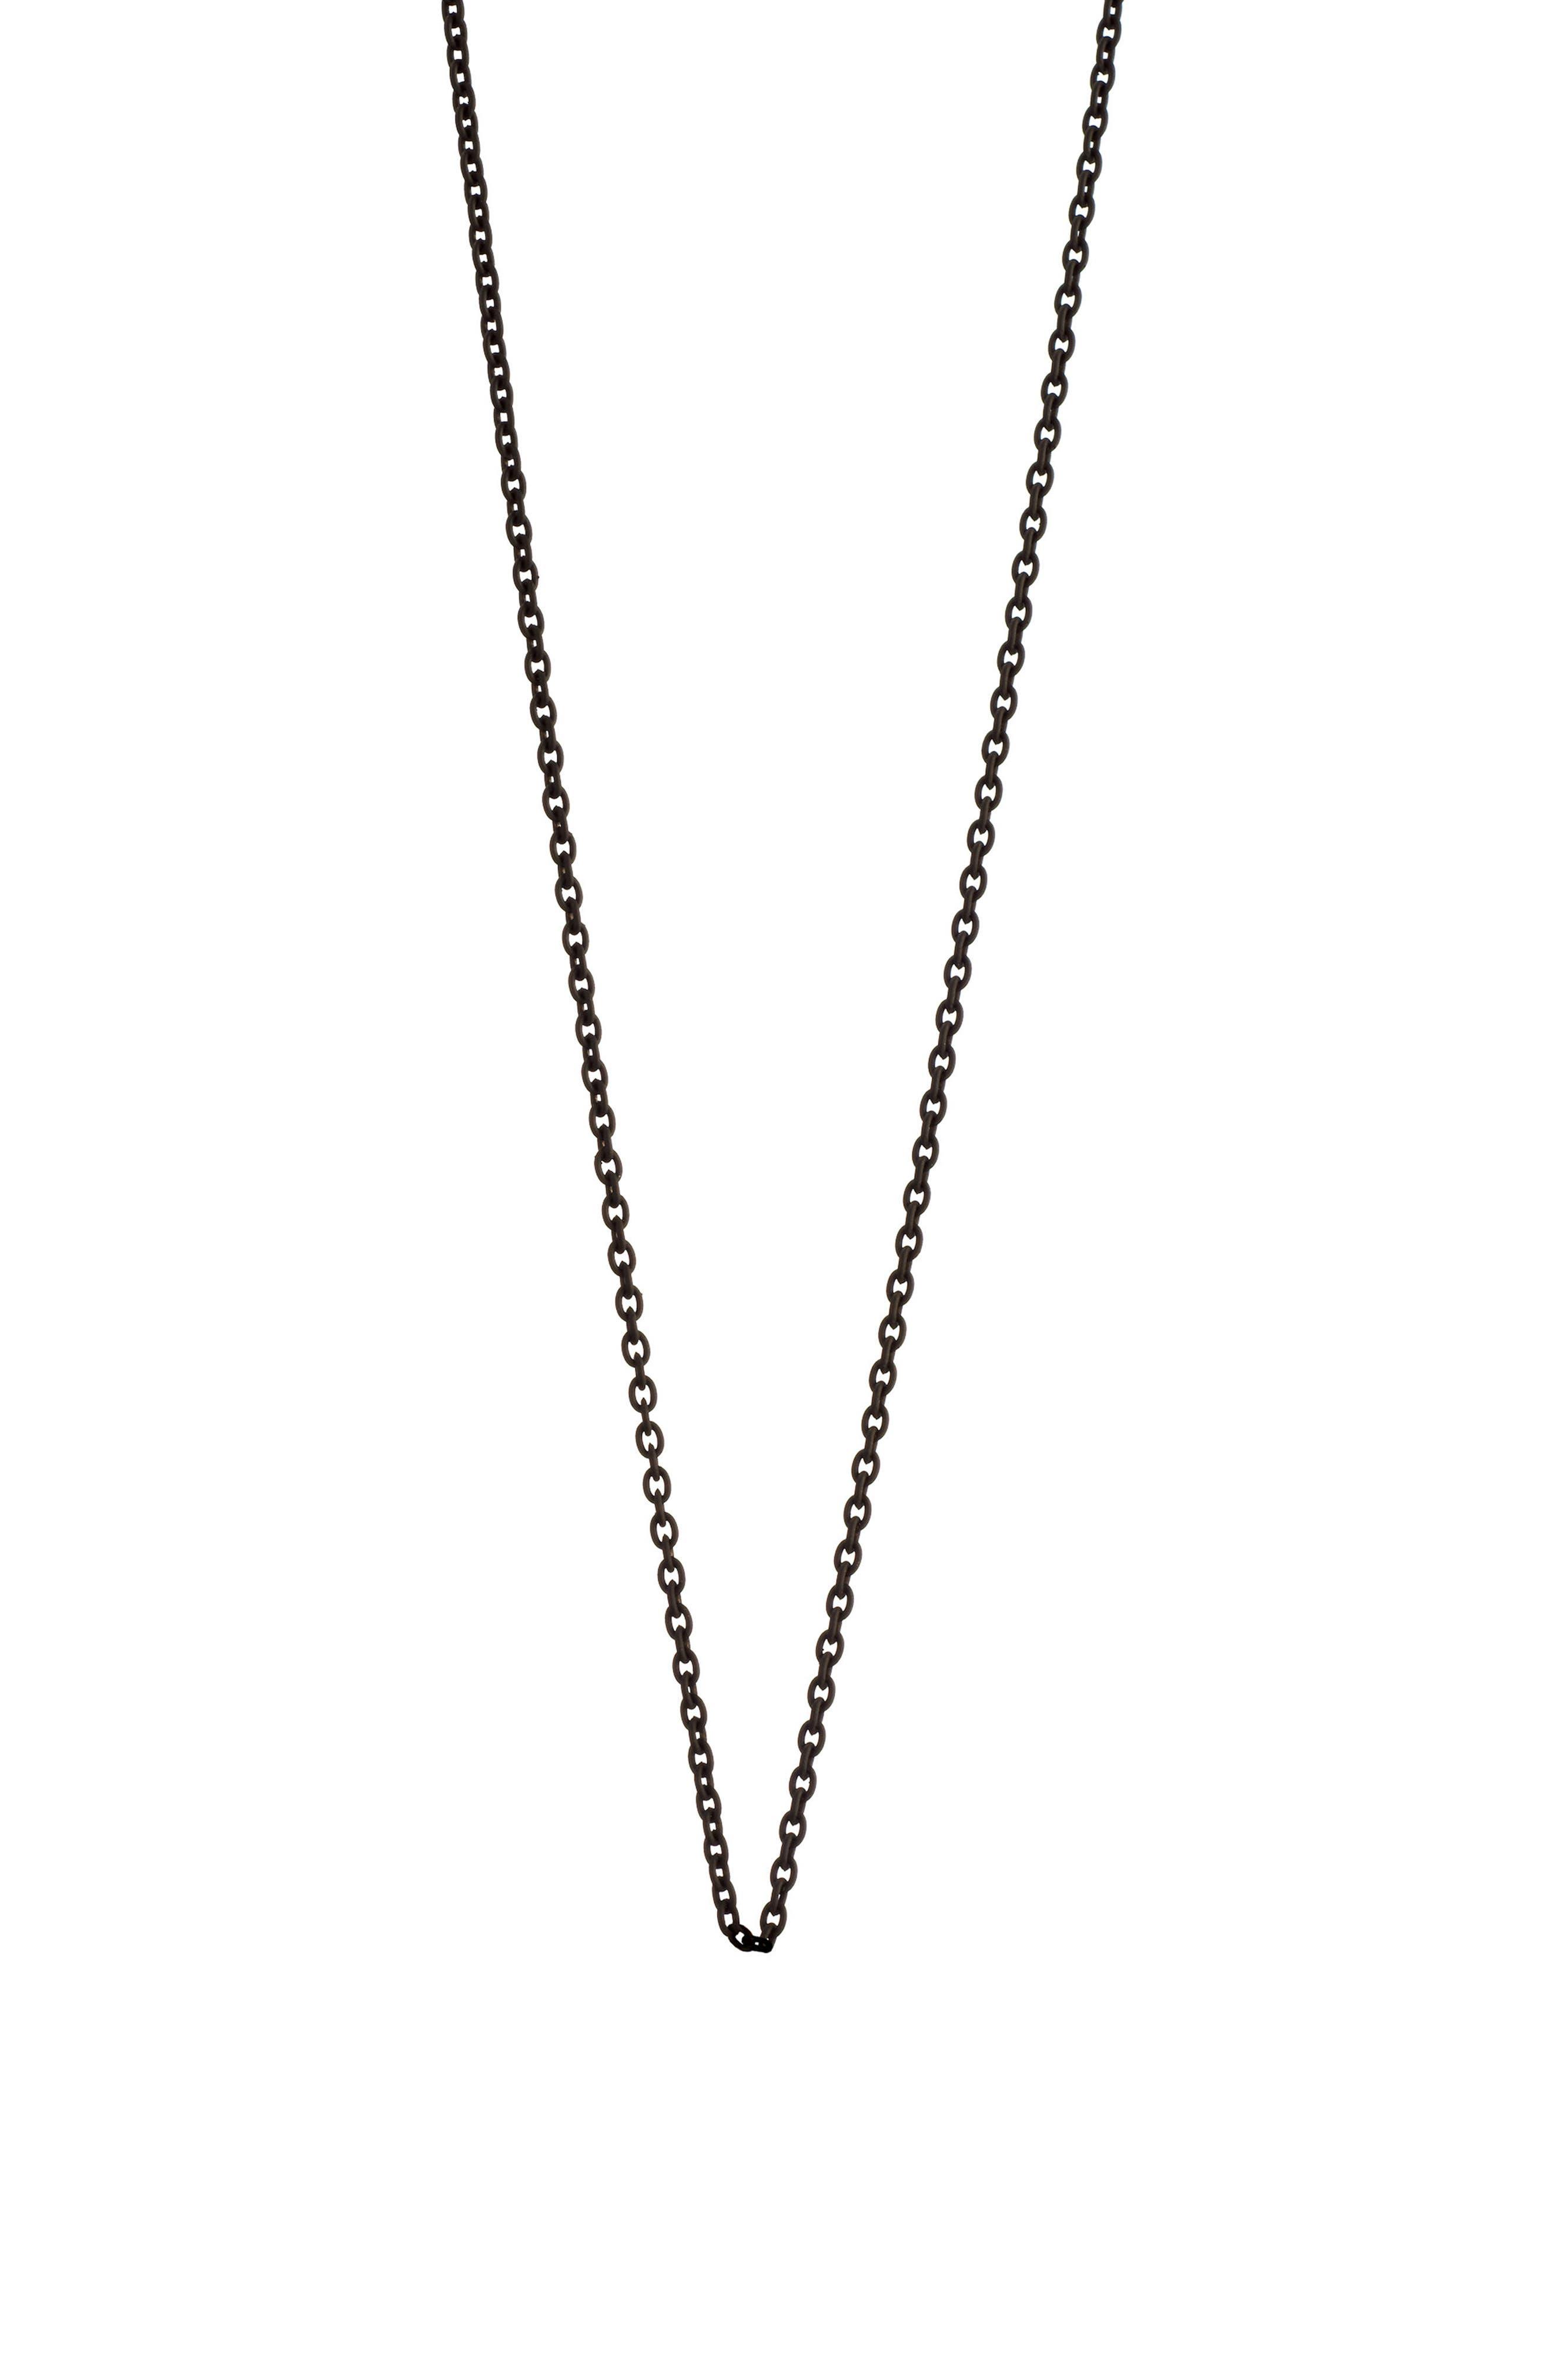 Black Steel Chain,                             Main thumbnail 1, color,                             BLACK STEEL